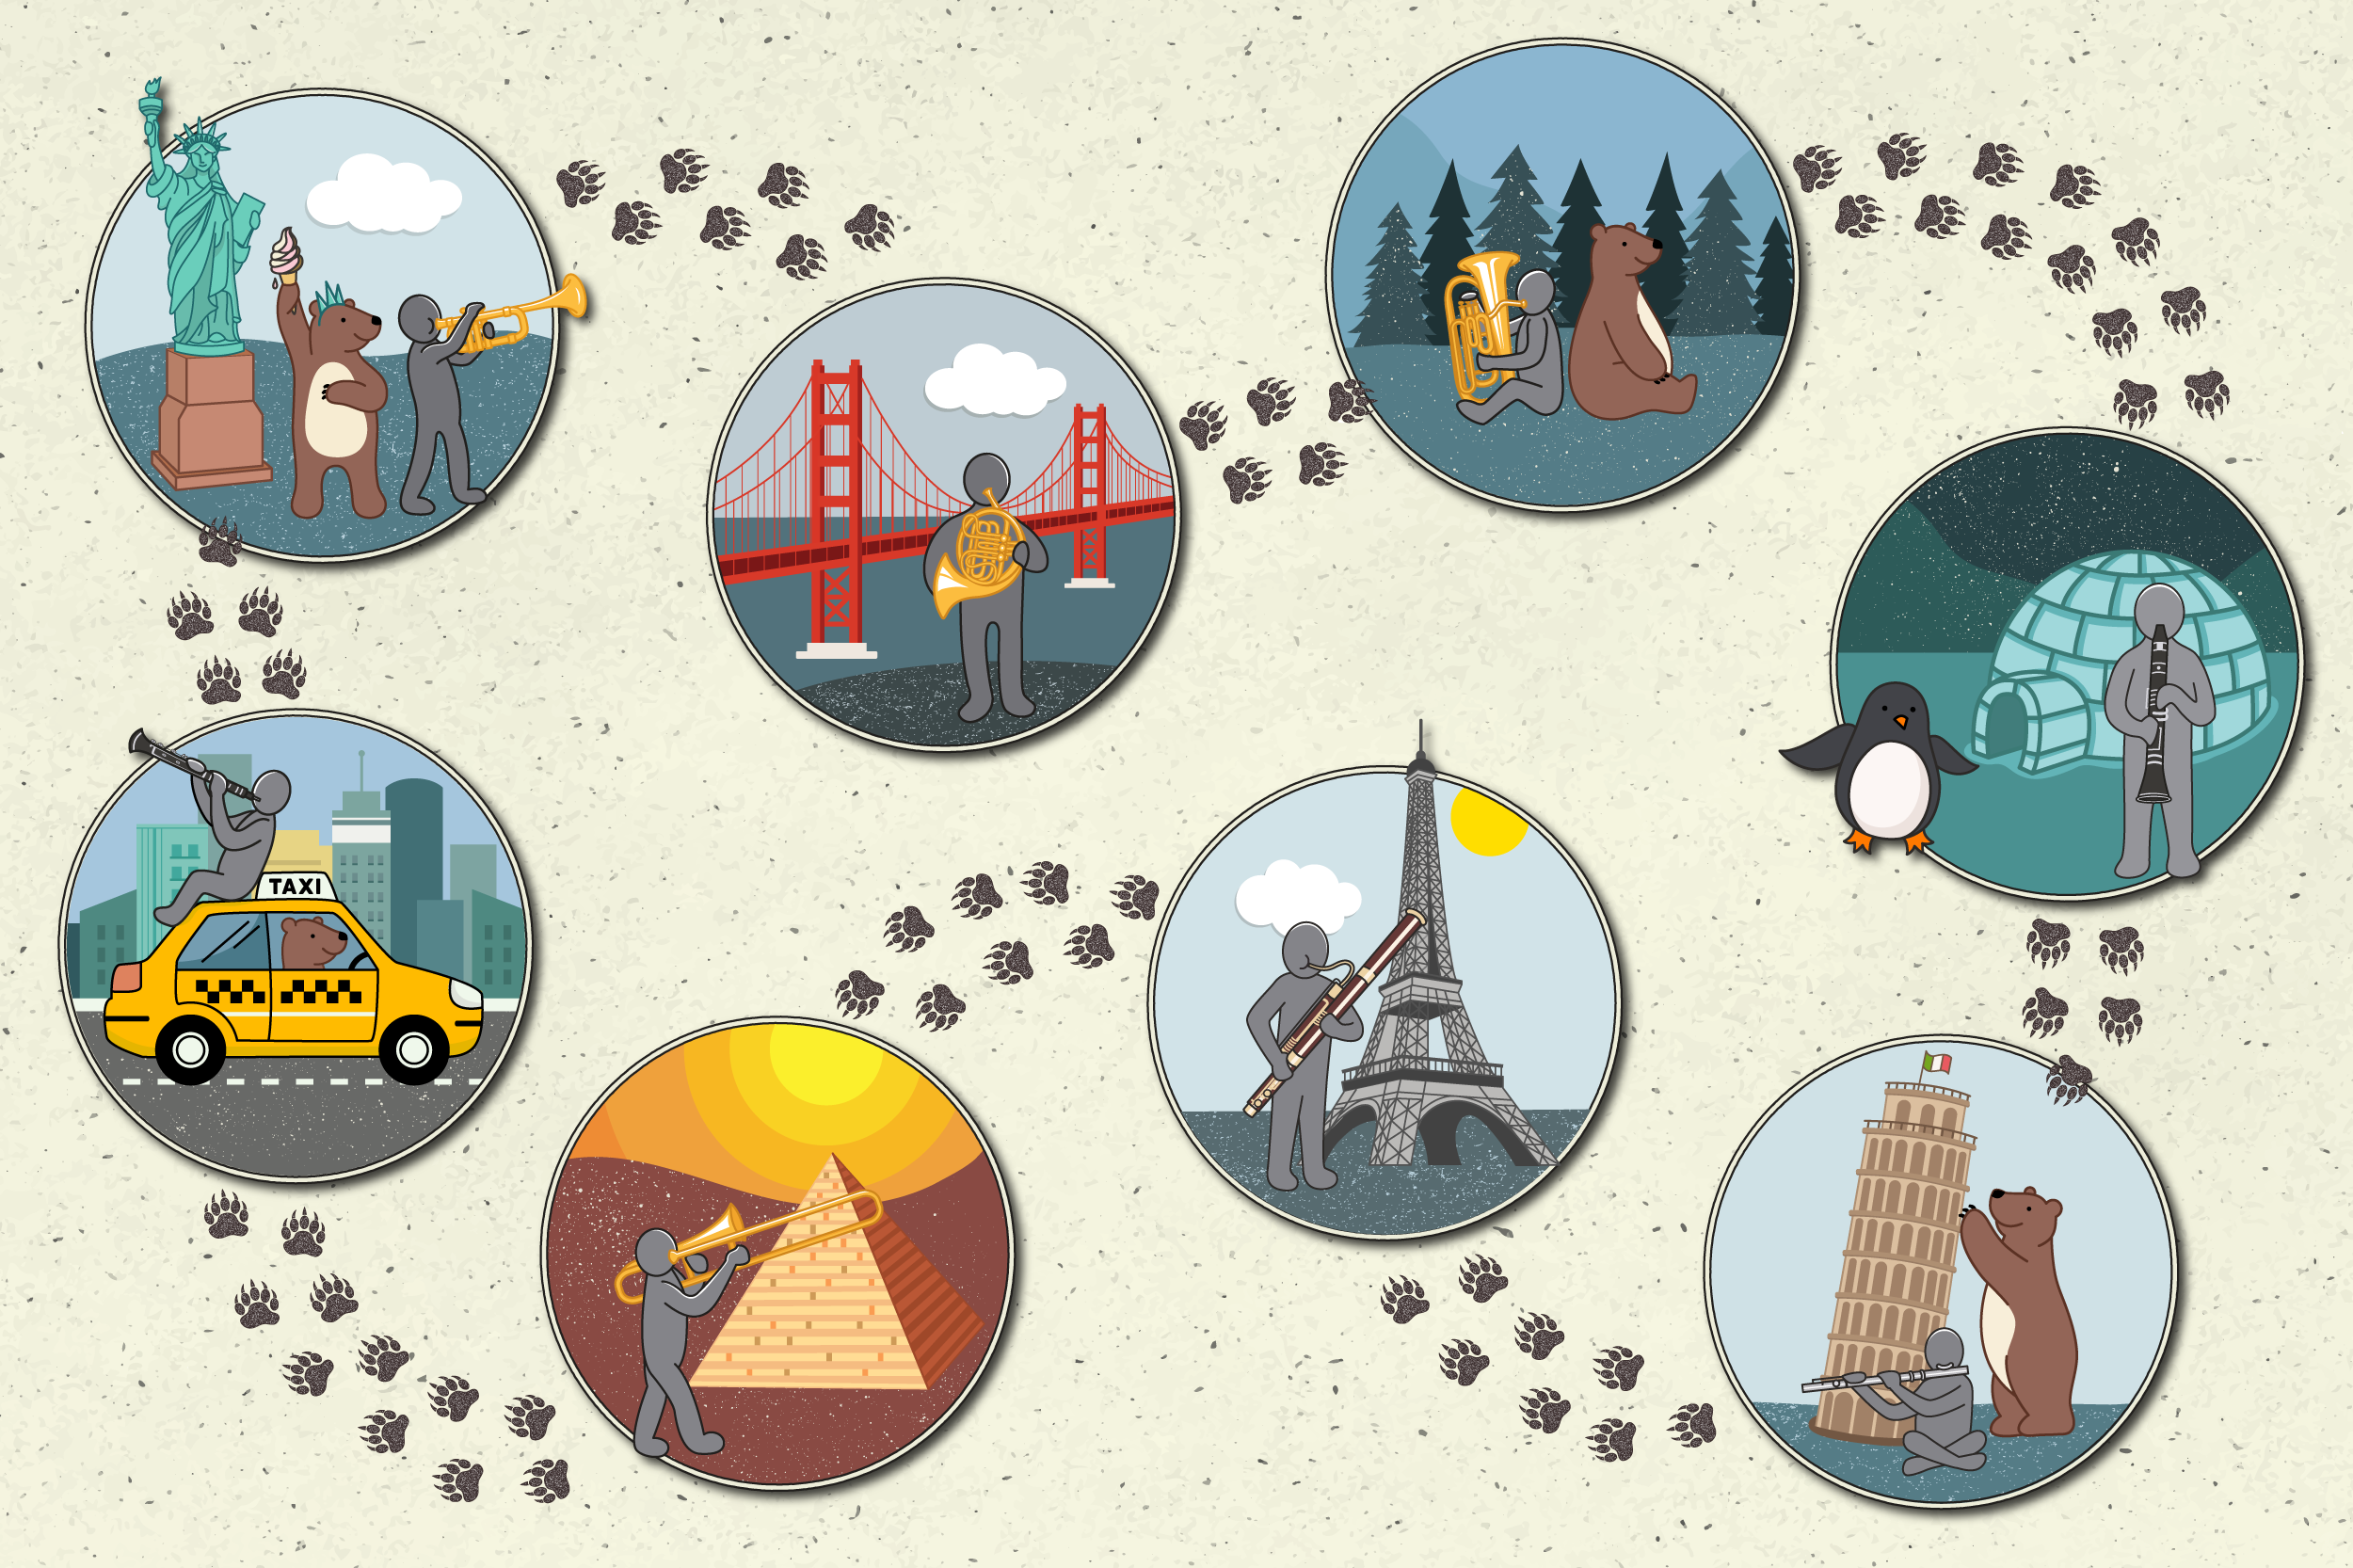 Create 8 mini-illustrations for Nomad Session